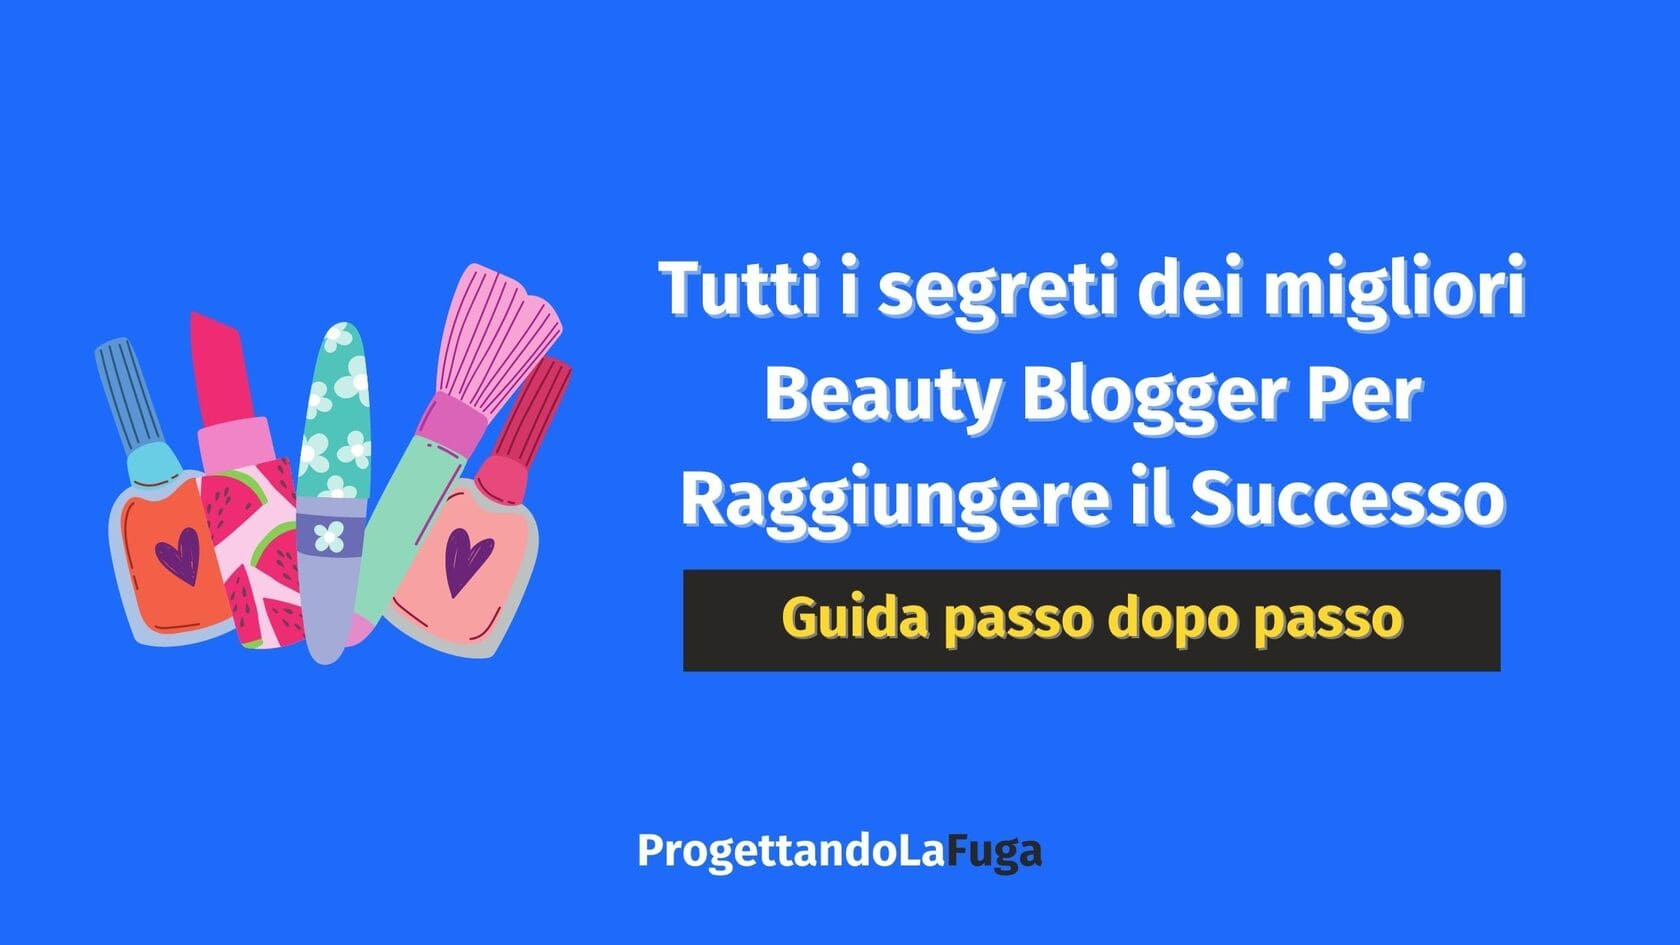 come creare un beauty blog